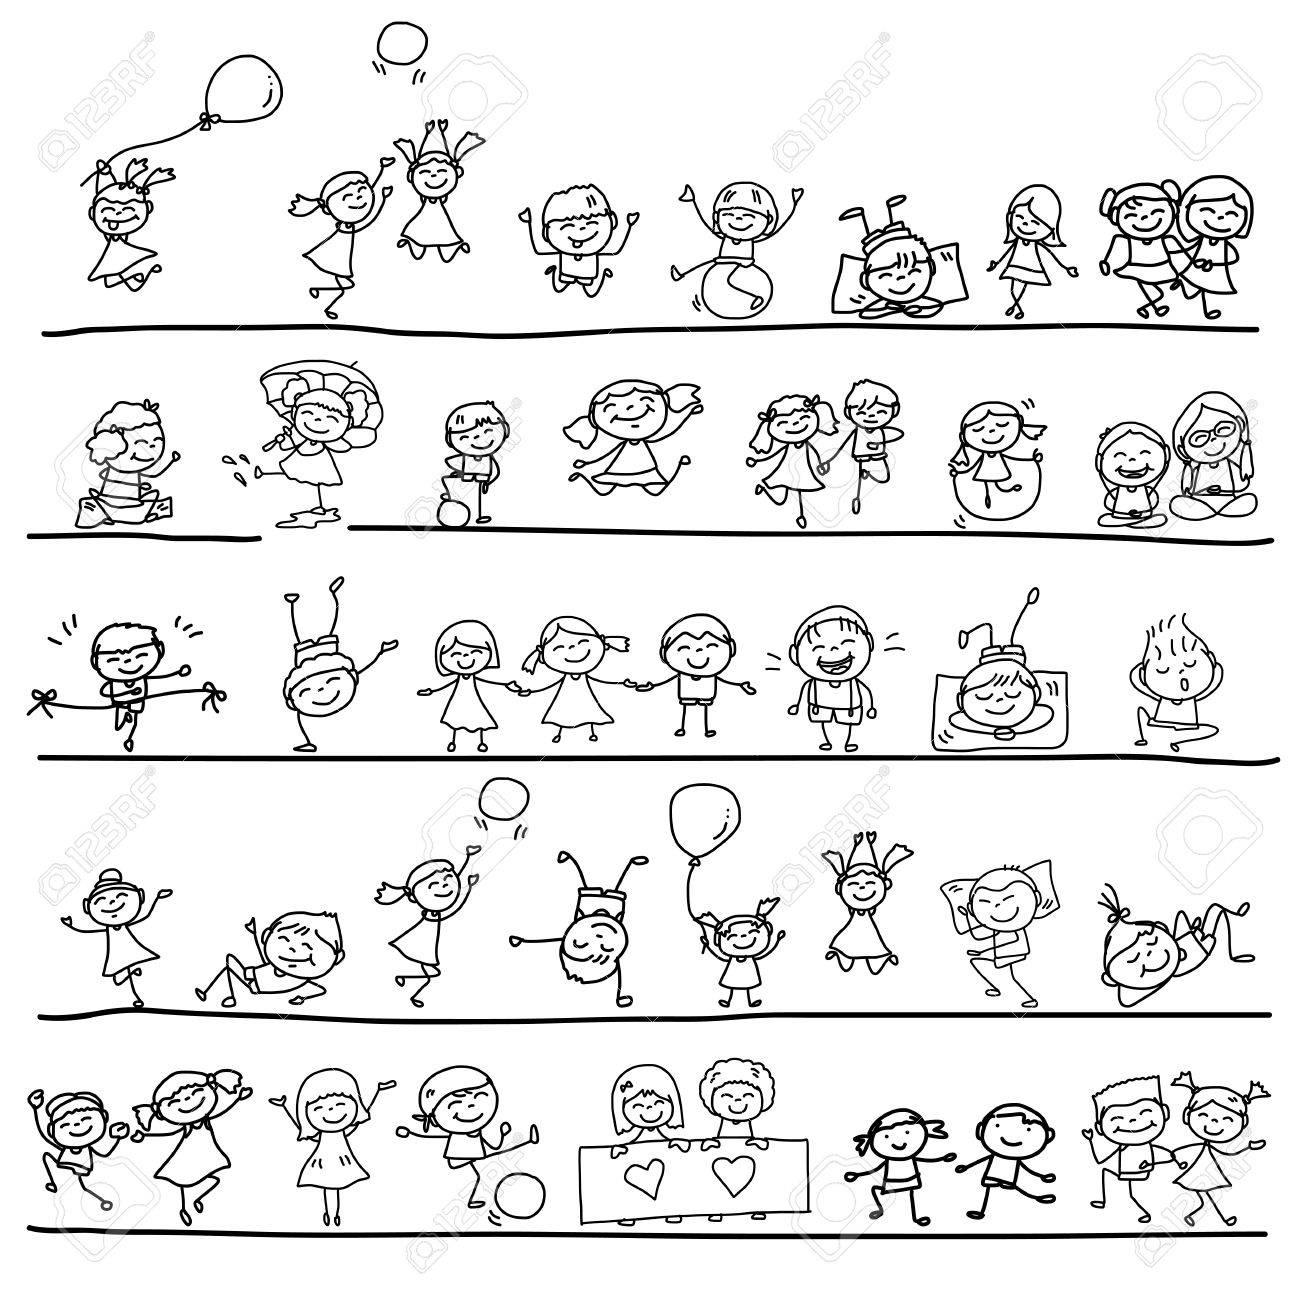 hand drawing cartoon character happy kids playing - 29861700